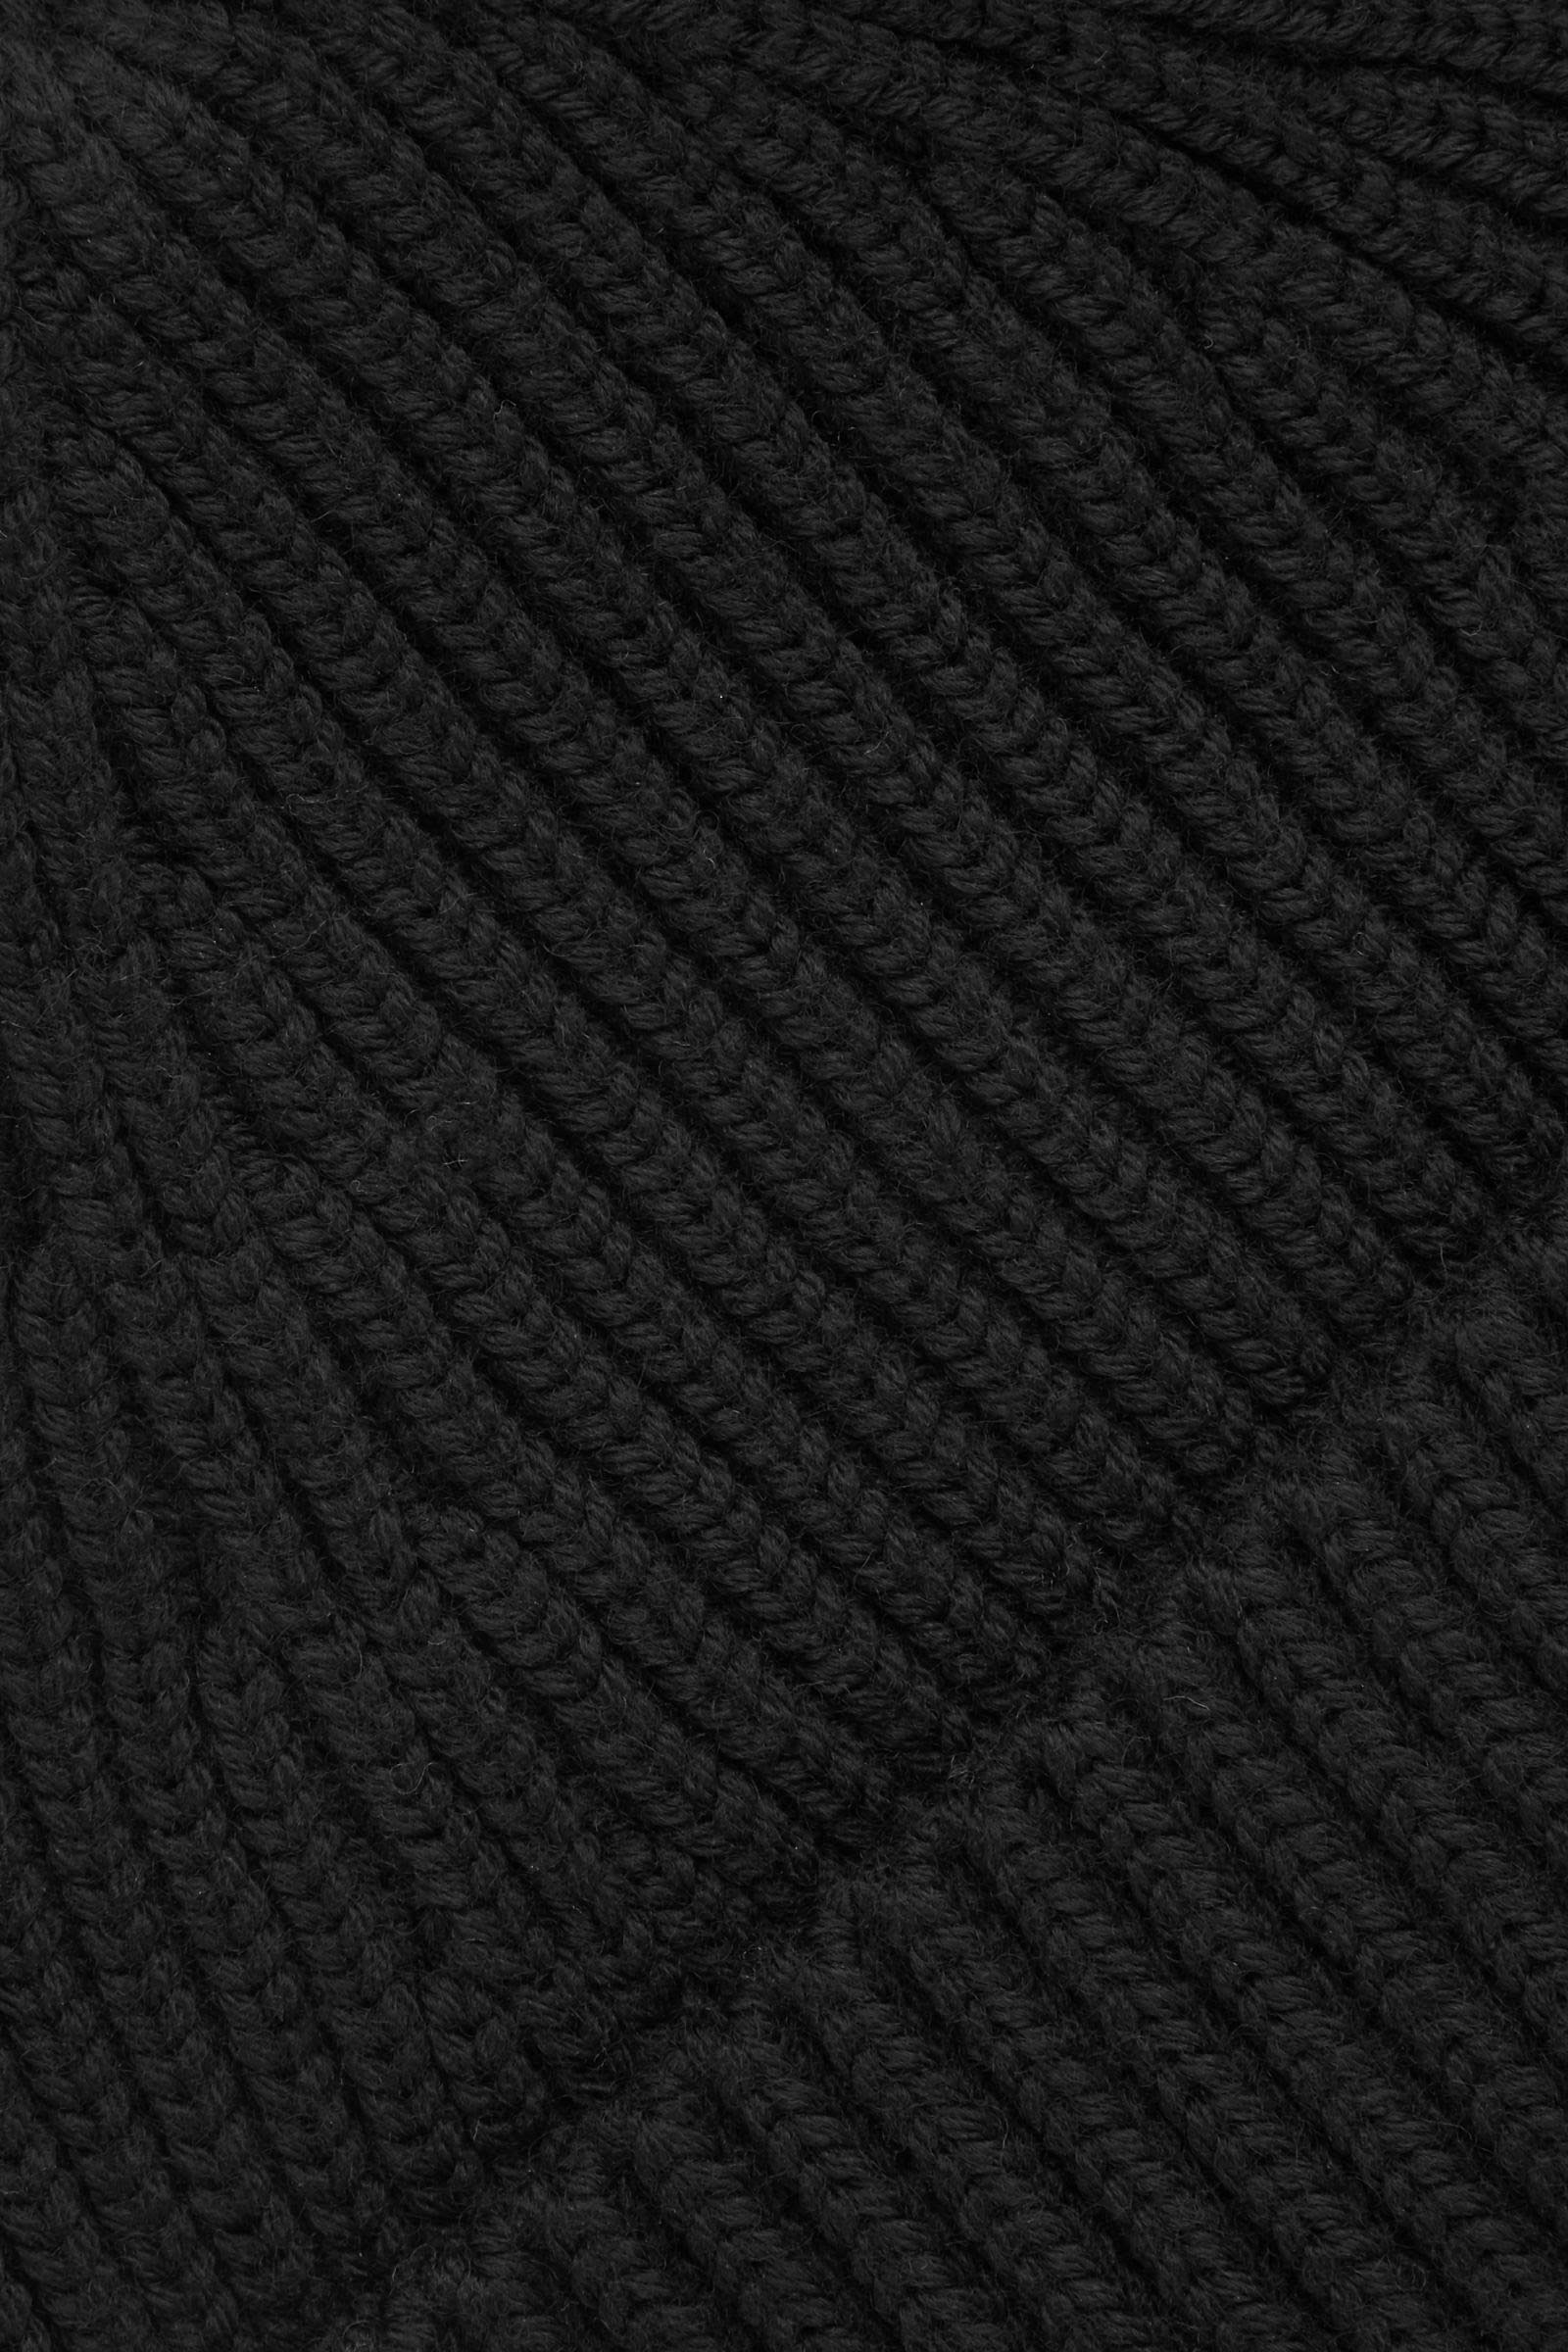 COS 쇼트 메리노 비니의 블랙컬러 Detail입니다.